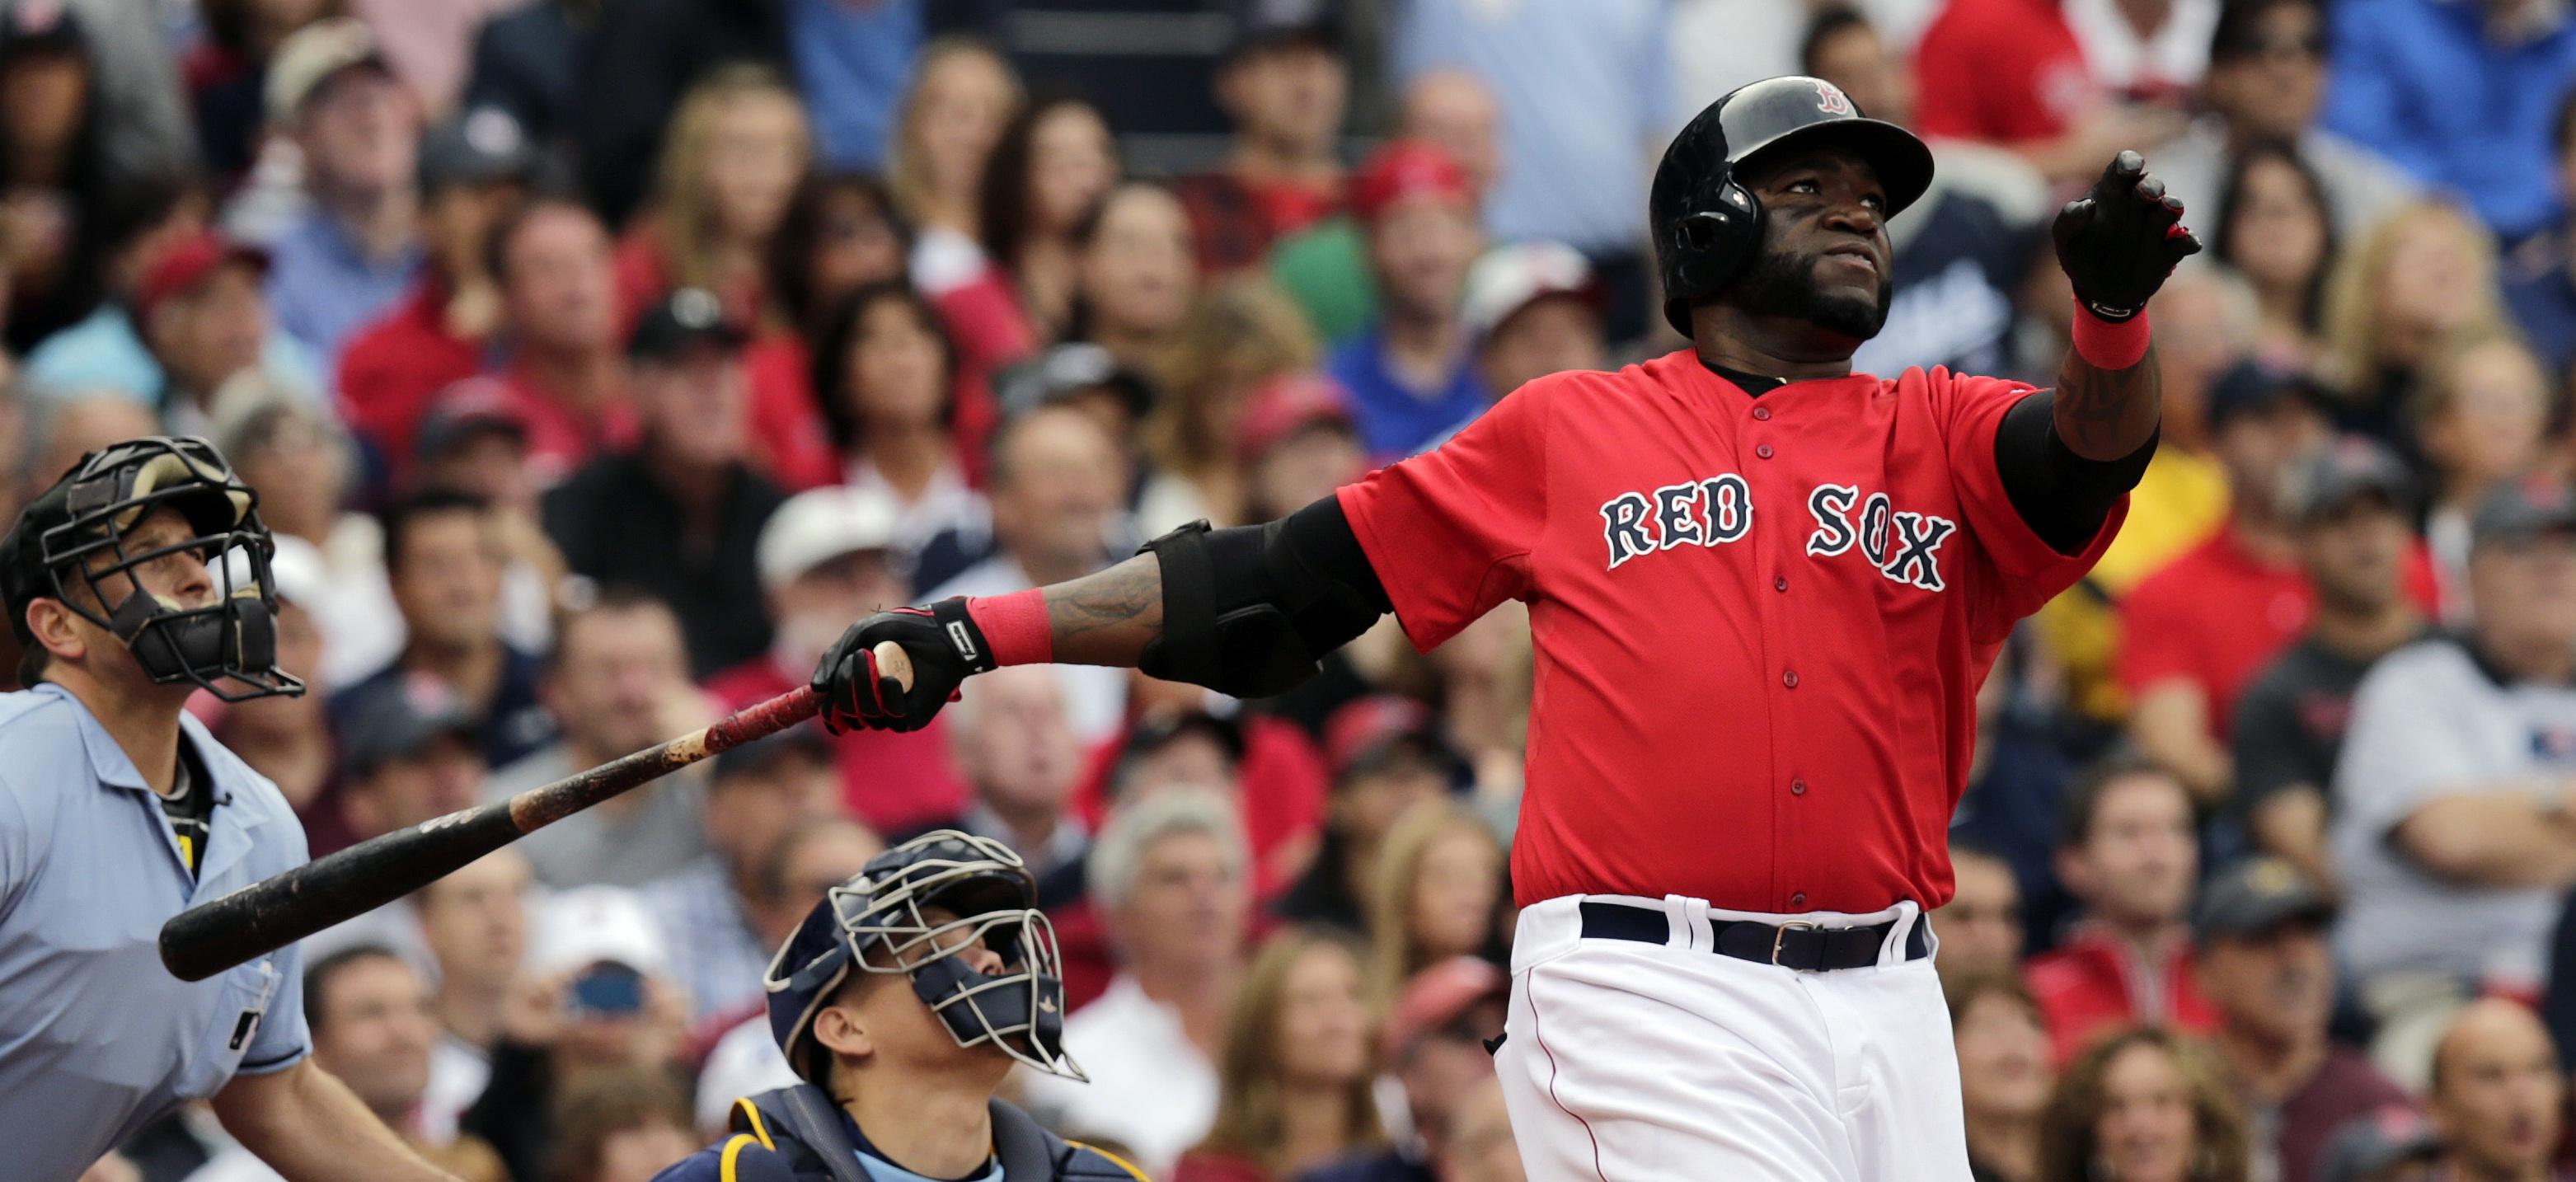 BOSTON RED SOX Baseball Mlb Jl Wallpaper